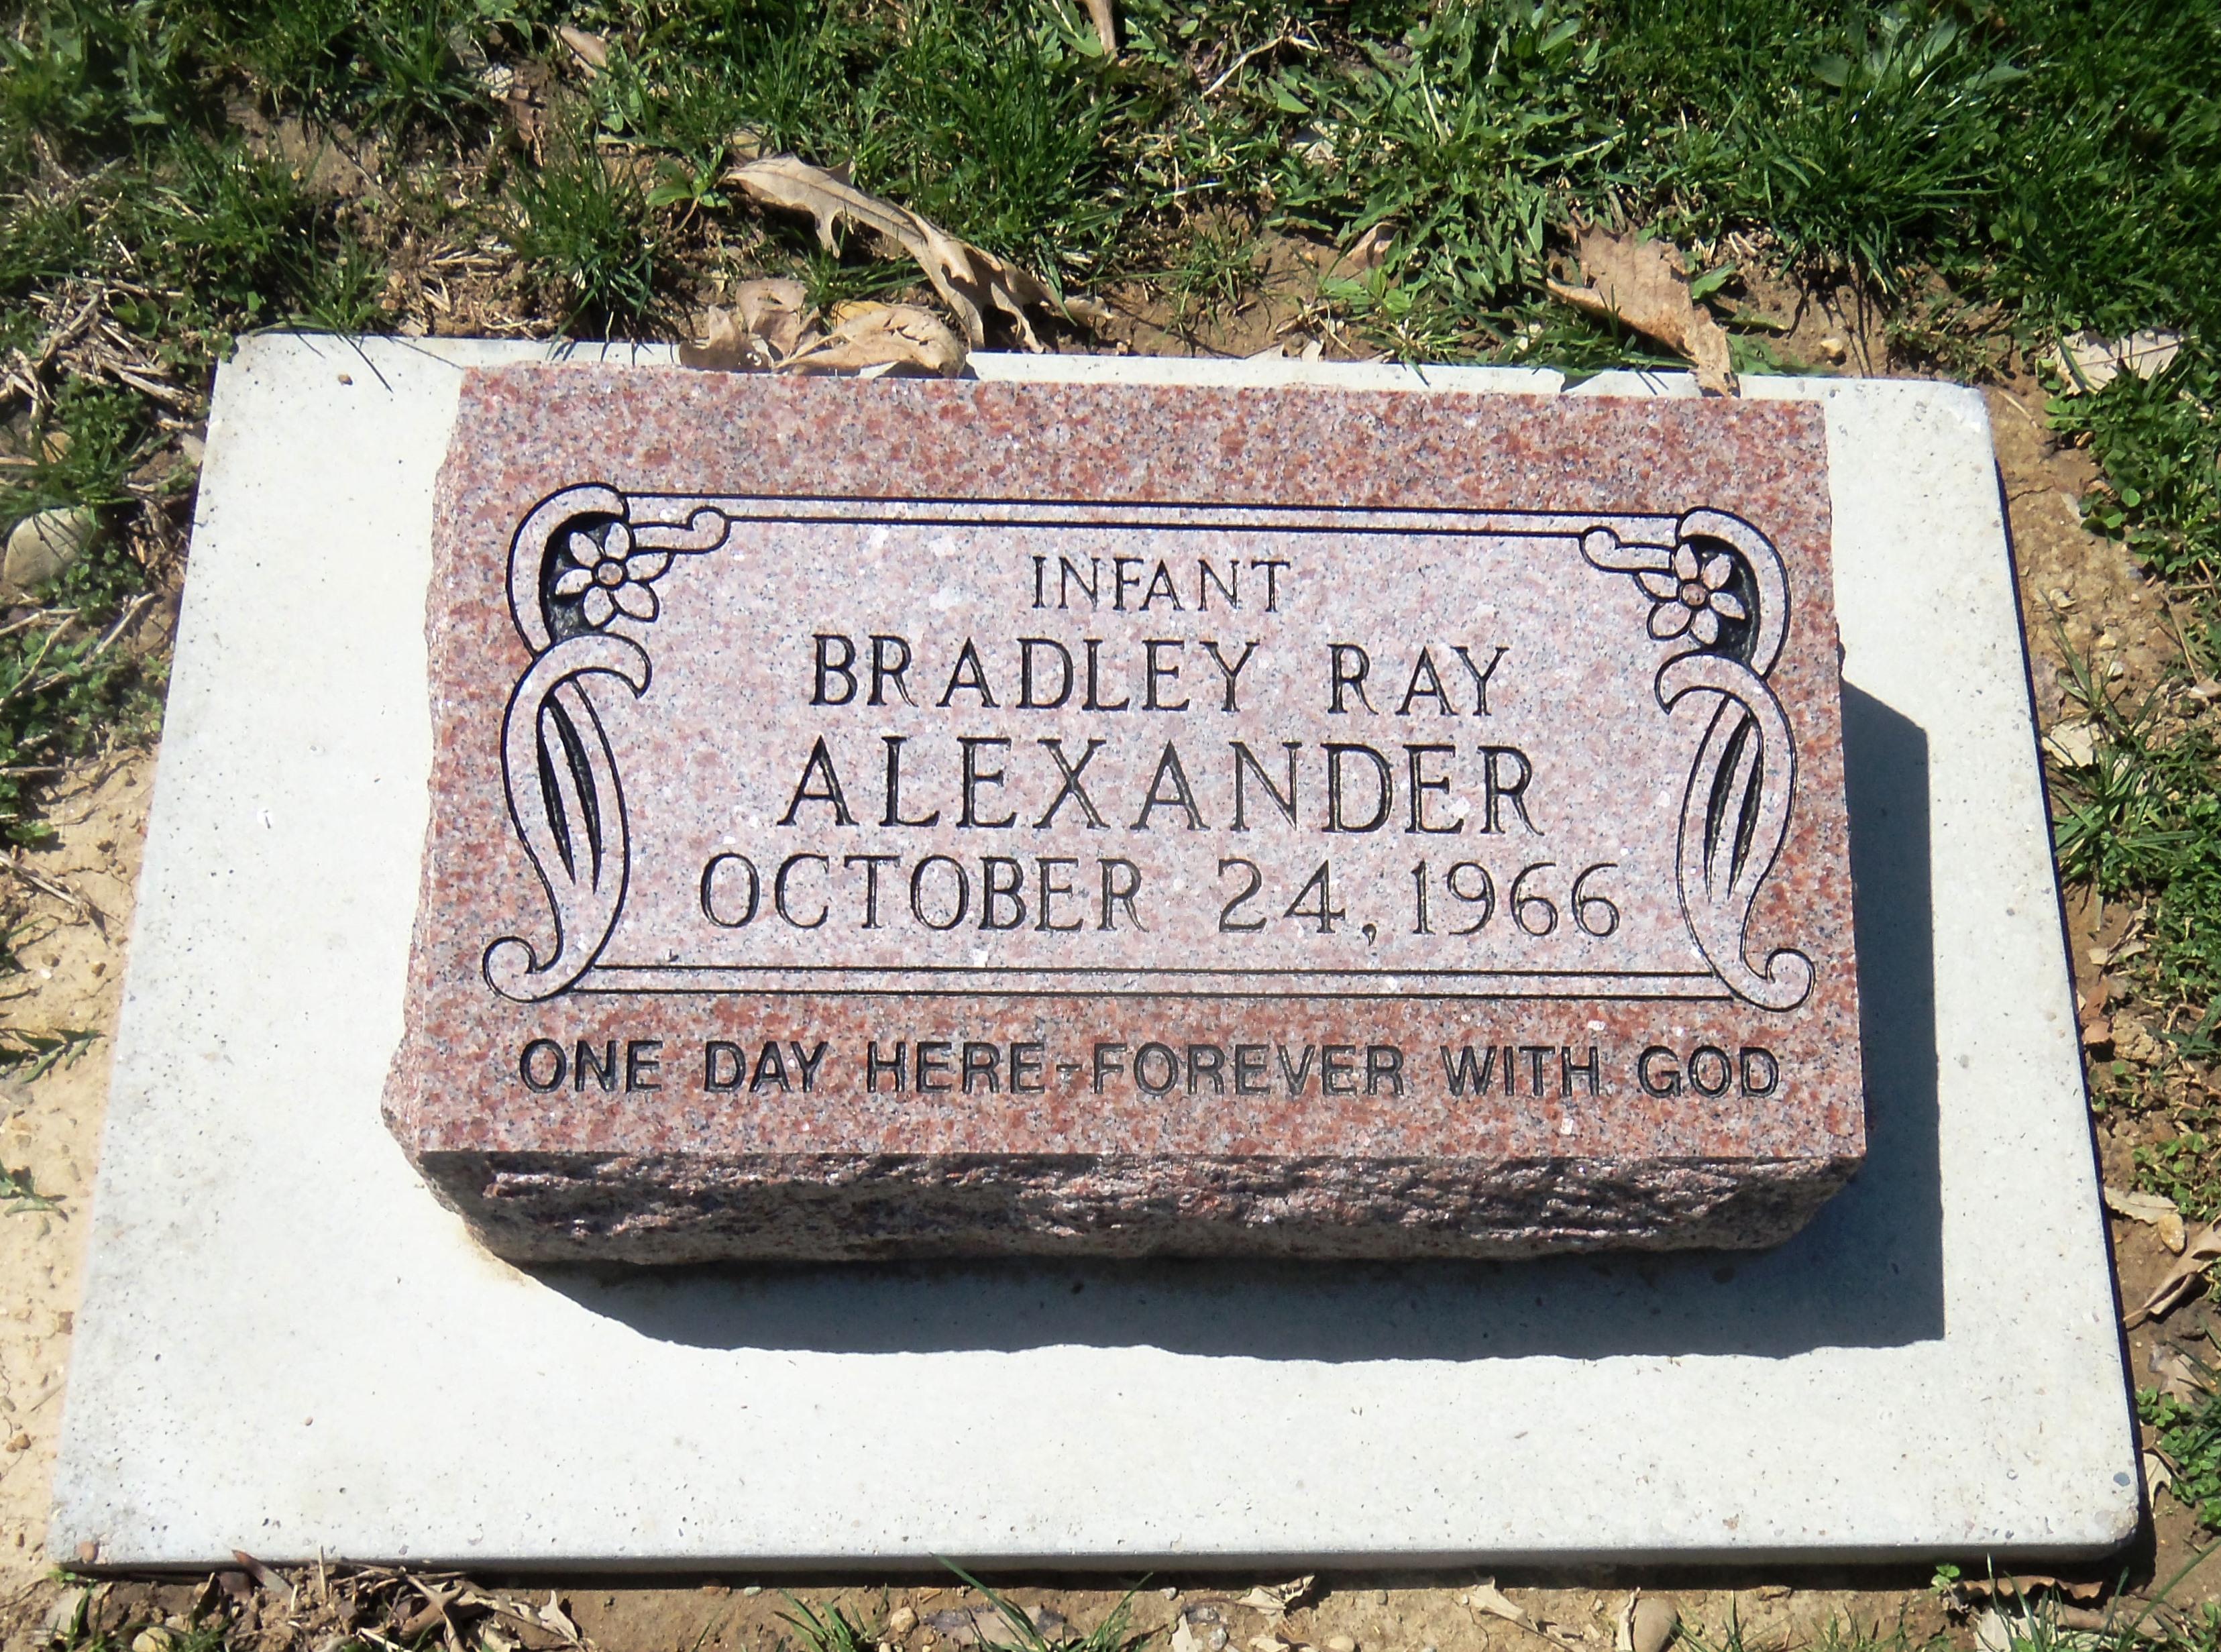 Bradley Ray Alexander